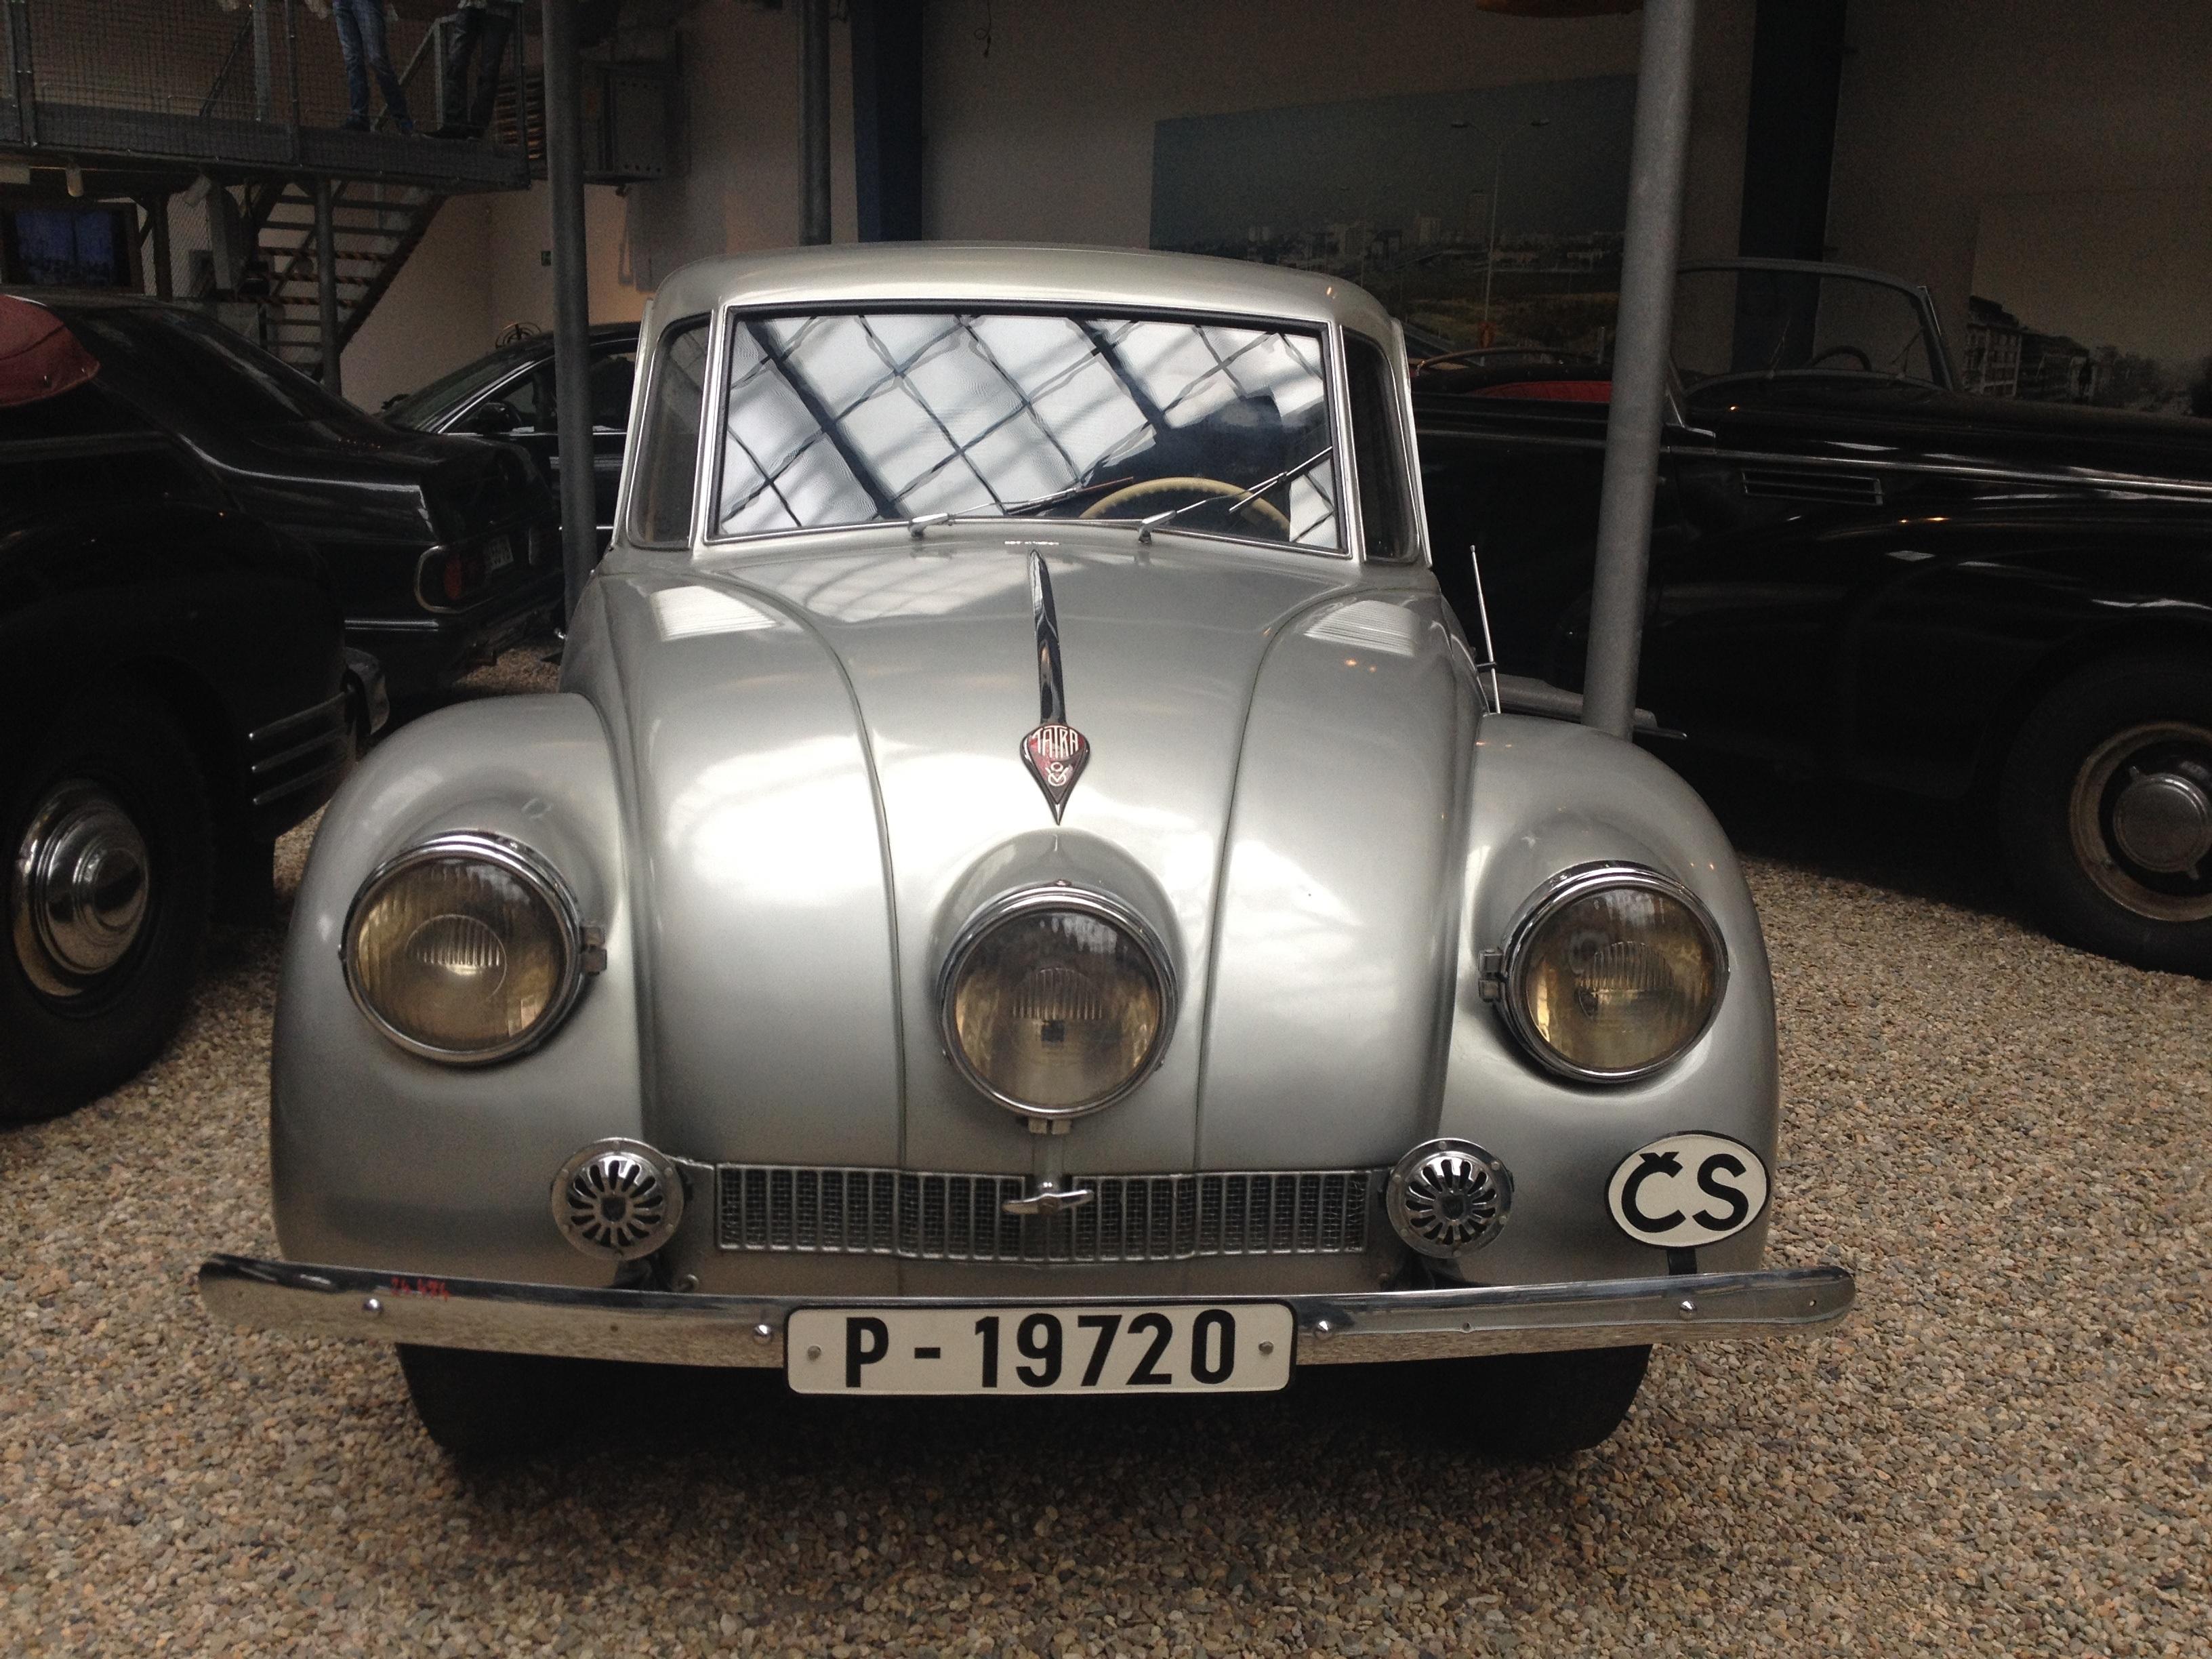 Kostenlose foto : Retro, Fahrzeug, Museum, Prag, altes Auto ...